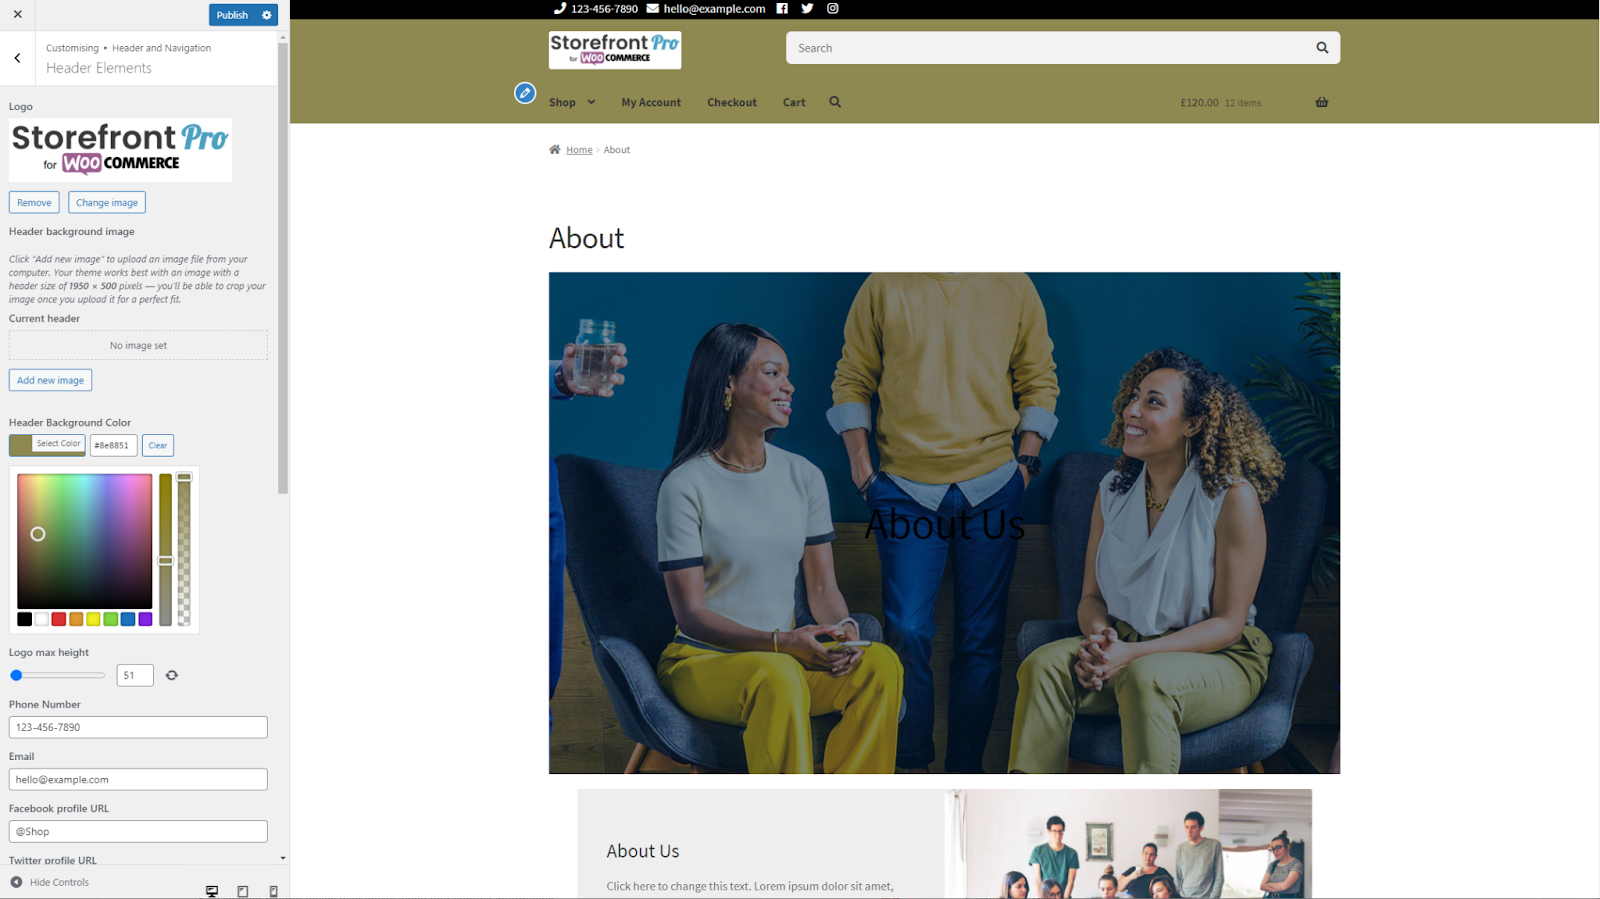 Changing Storefront Pro header elements